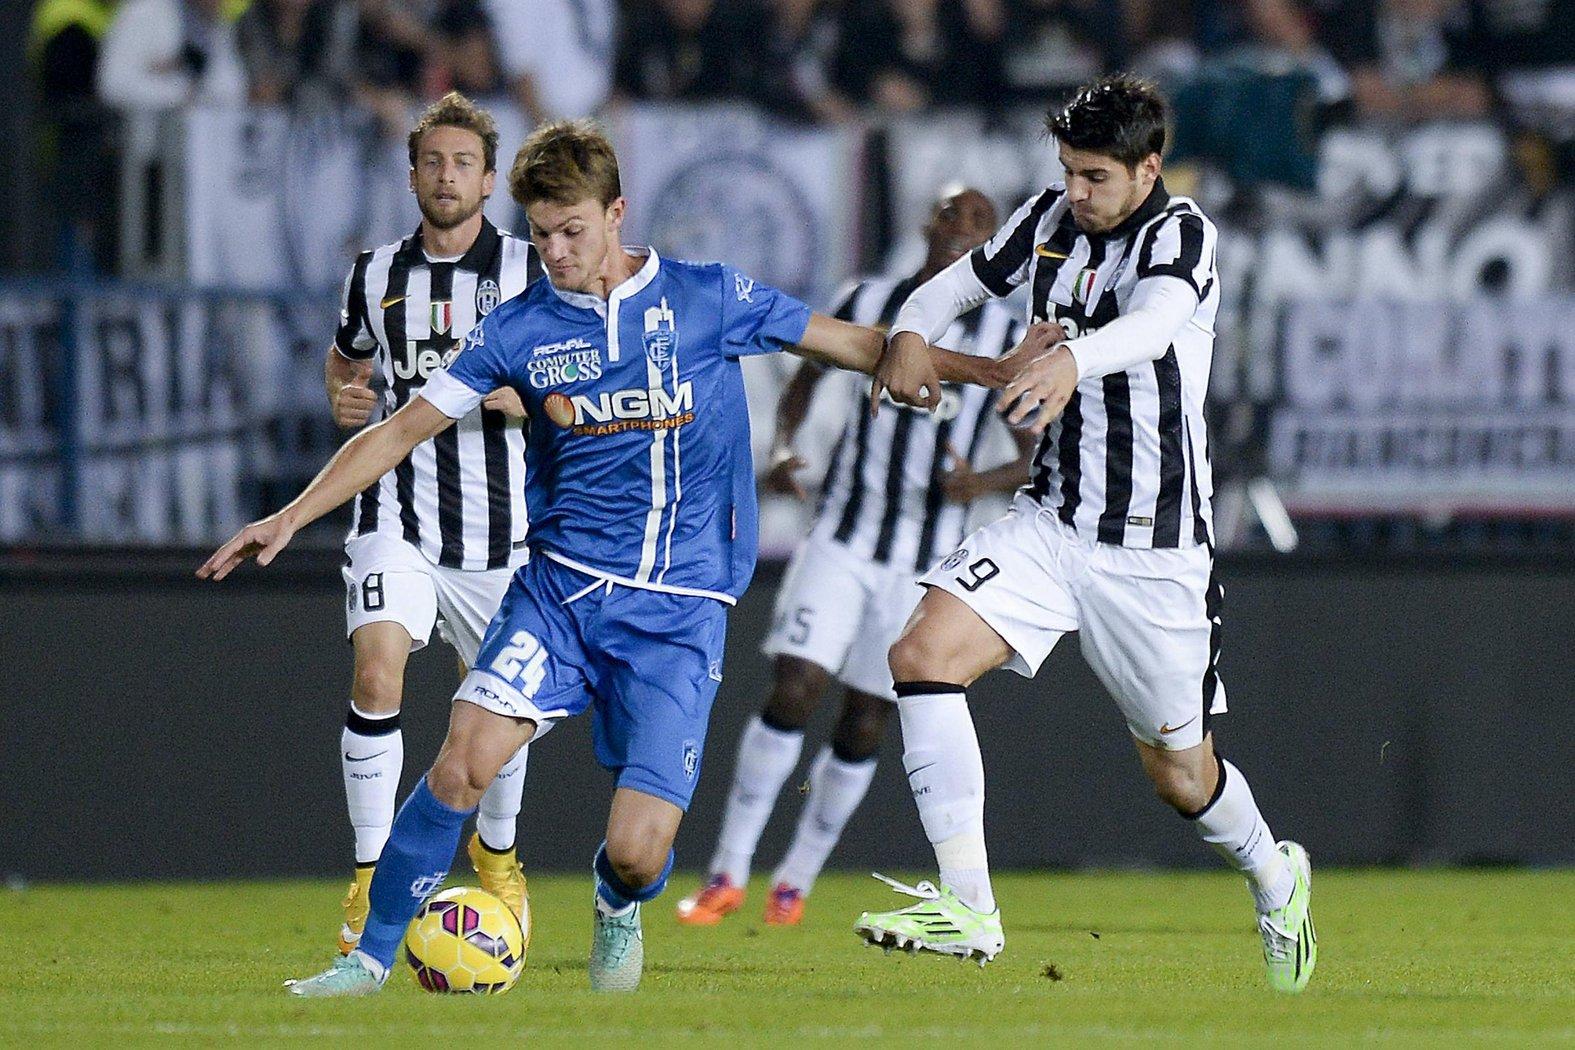 Empoli Vs Juventus Free Betting Tips 27 10